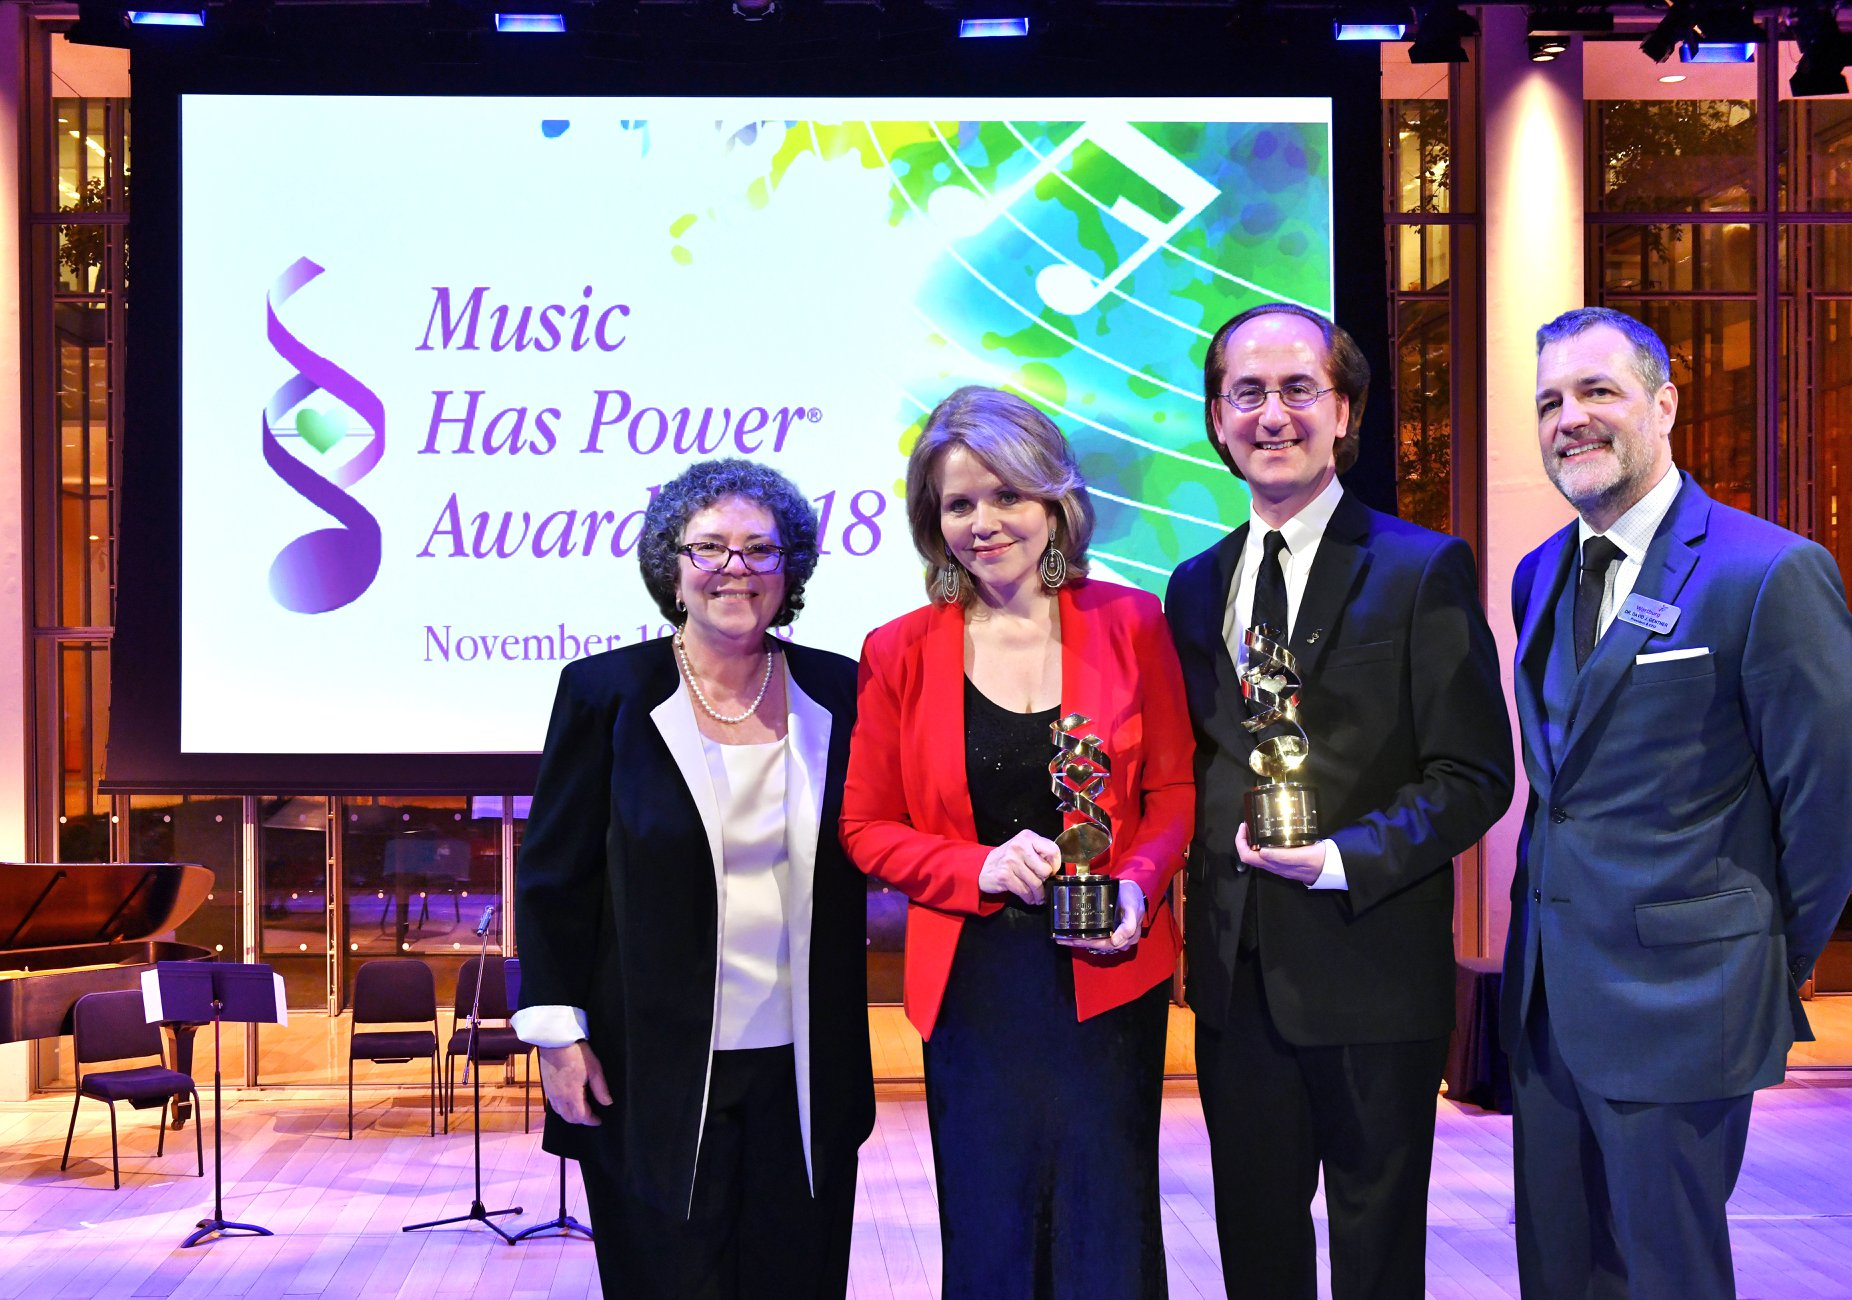 Dr. Concetta Tomaino, Renée Fleming, Harry Ballan and David J. Gentner